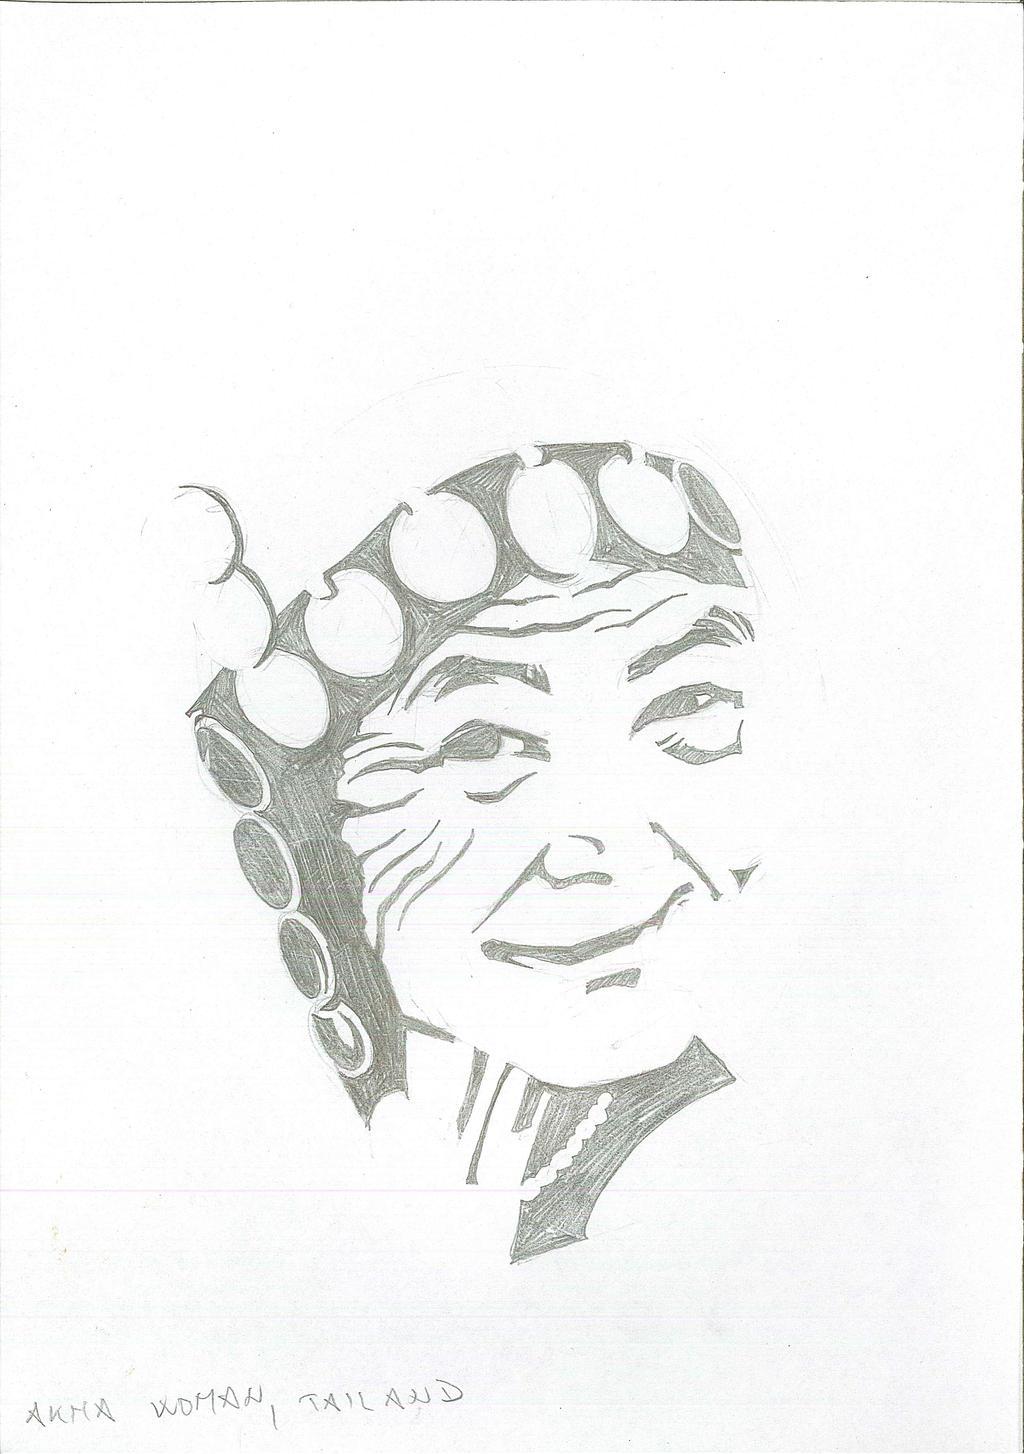 Akha Woman (Thailand) by brrkovi